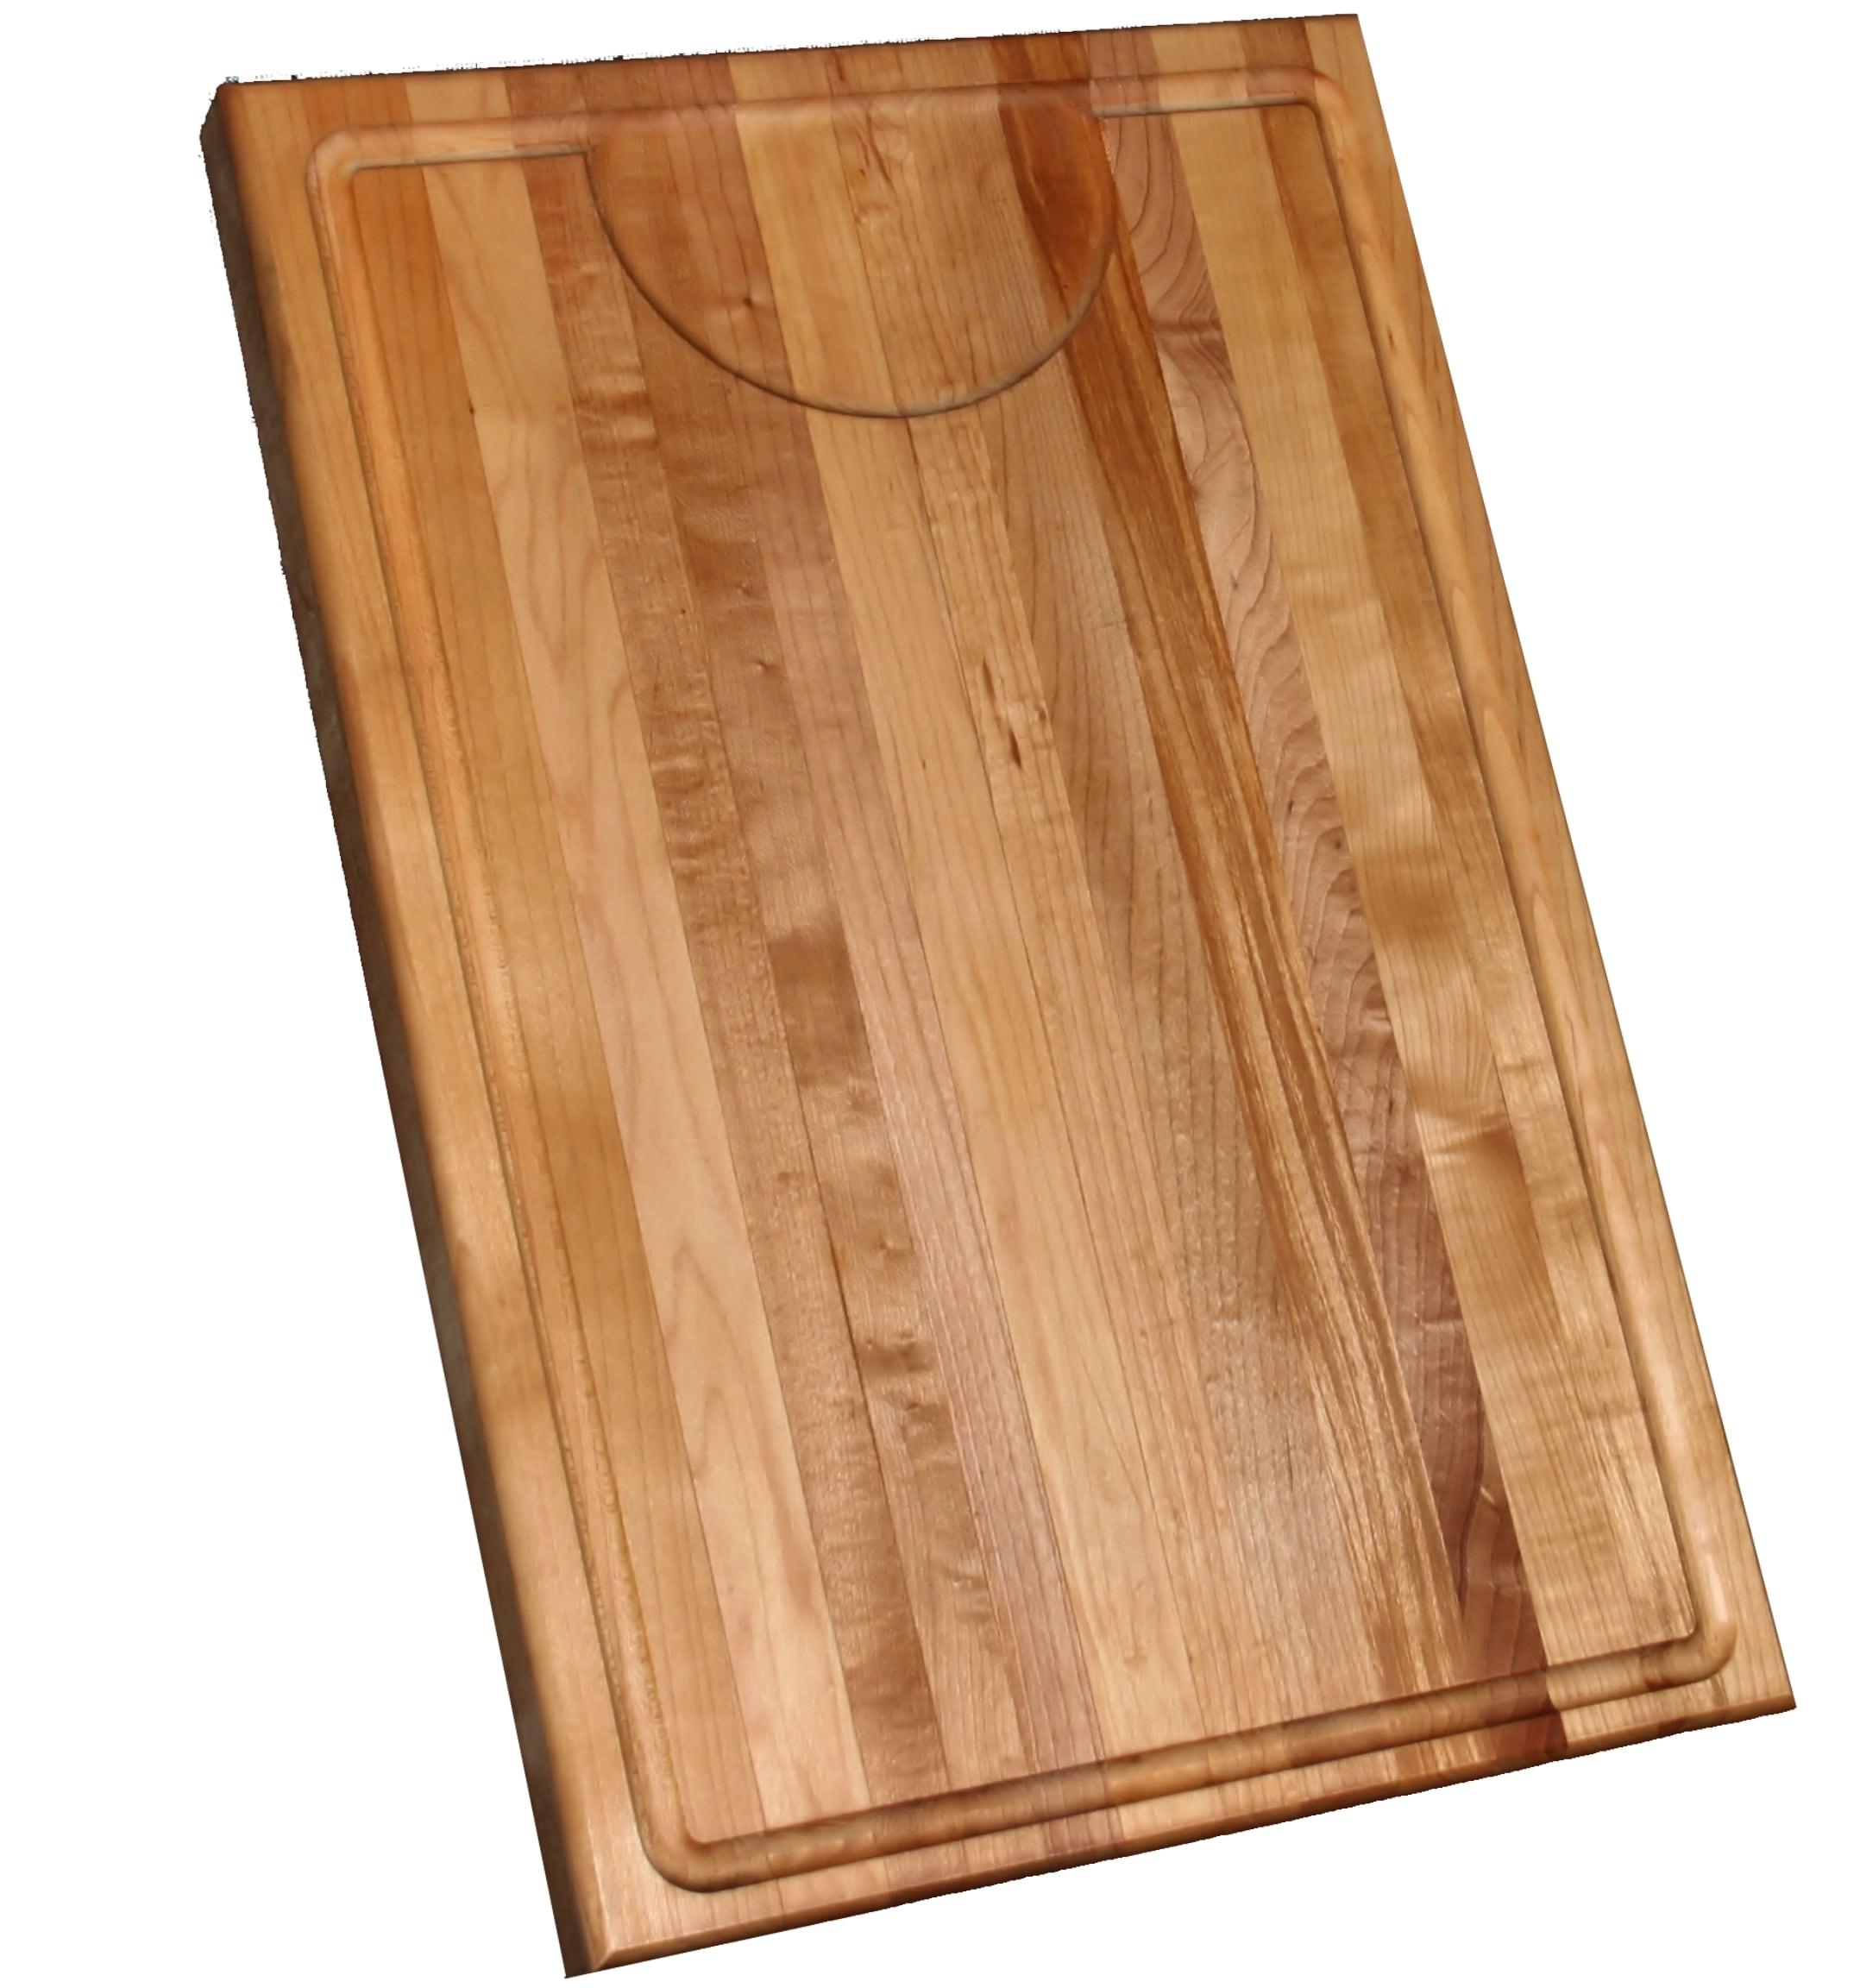 Maple Edge Grain 12x18-inch Cutting Board